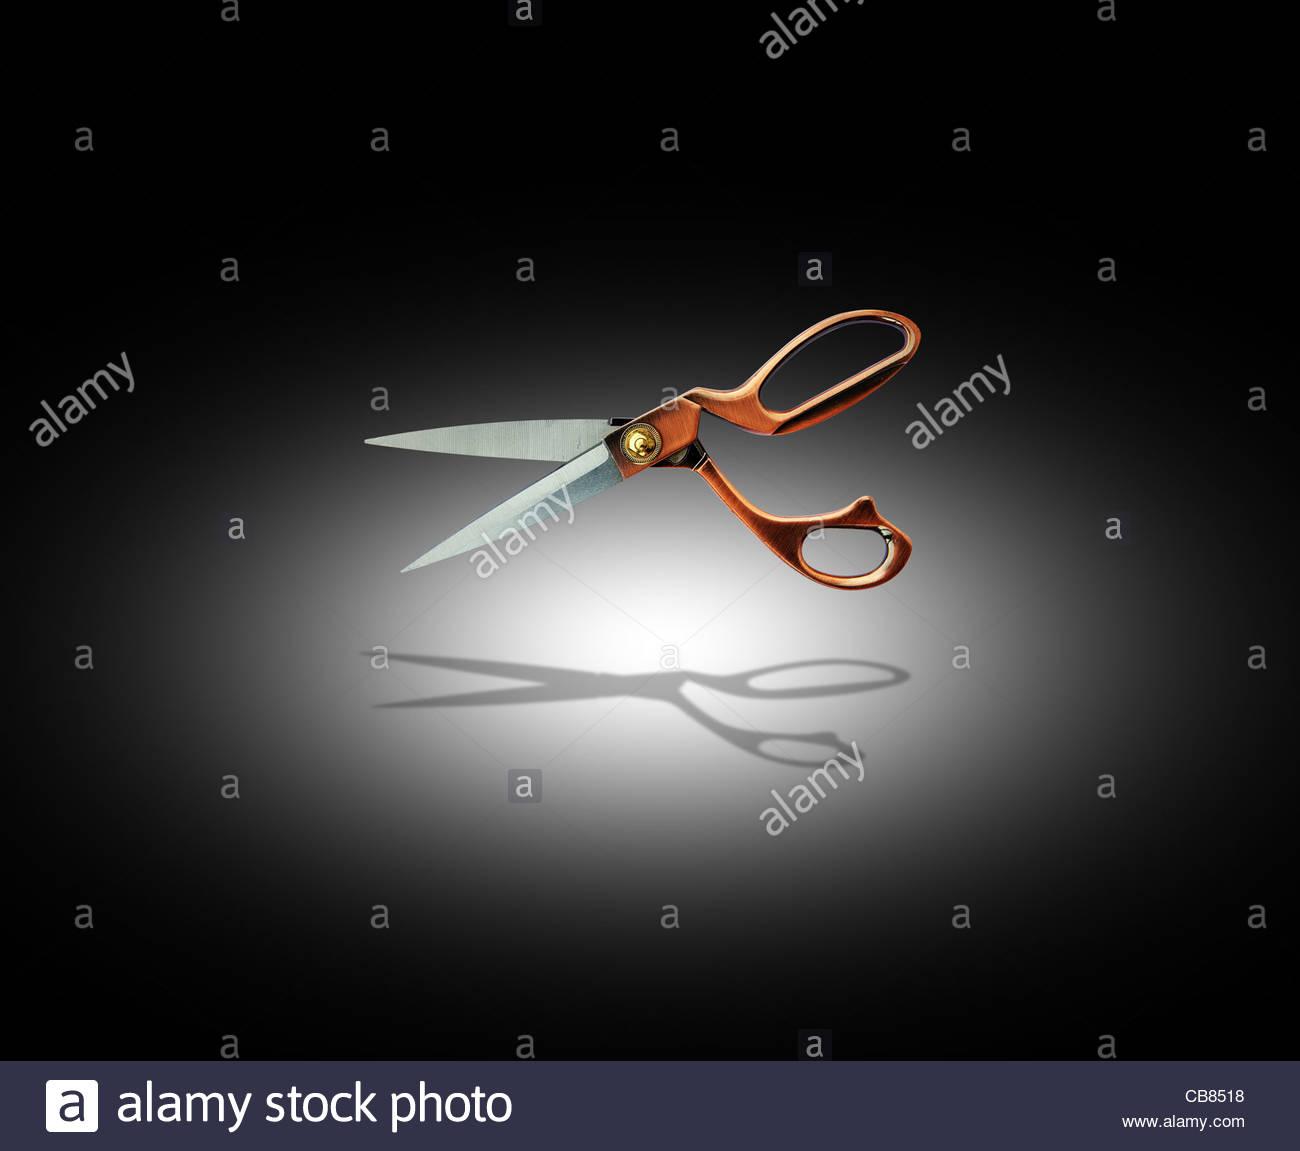 fashion scissors - Stock Image